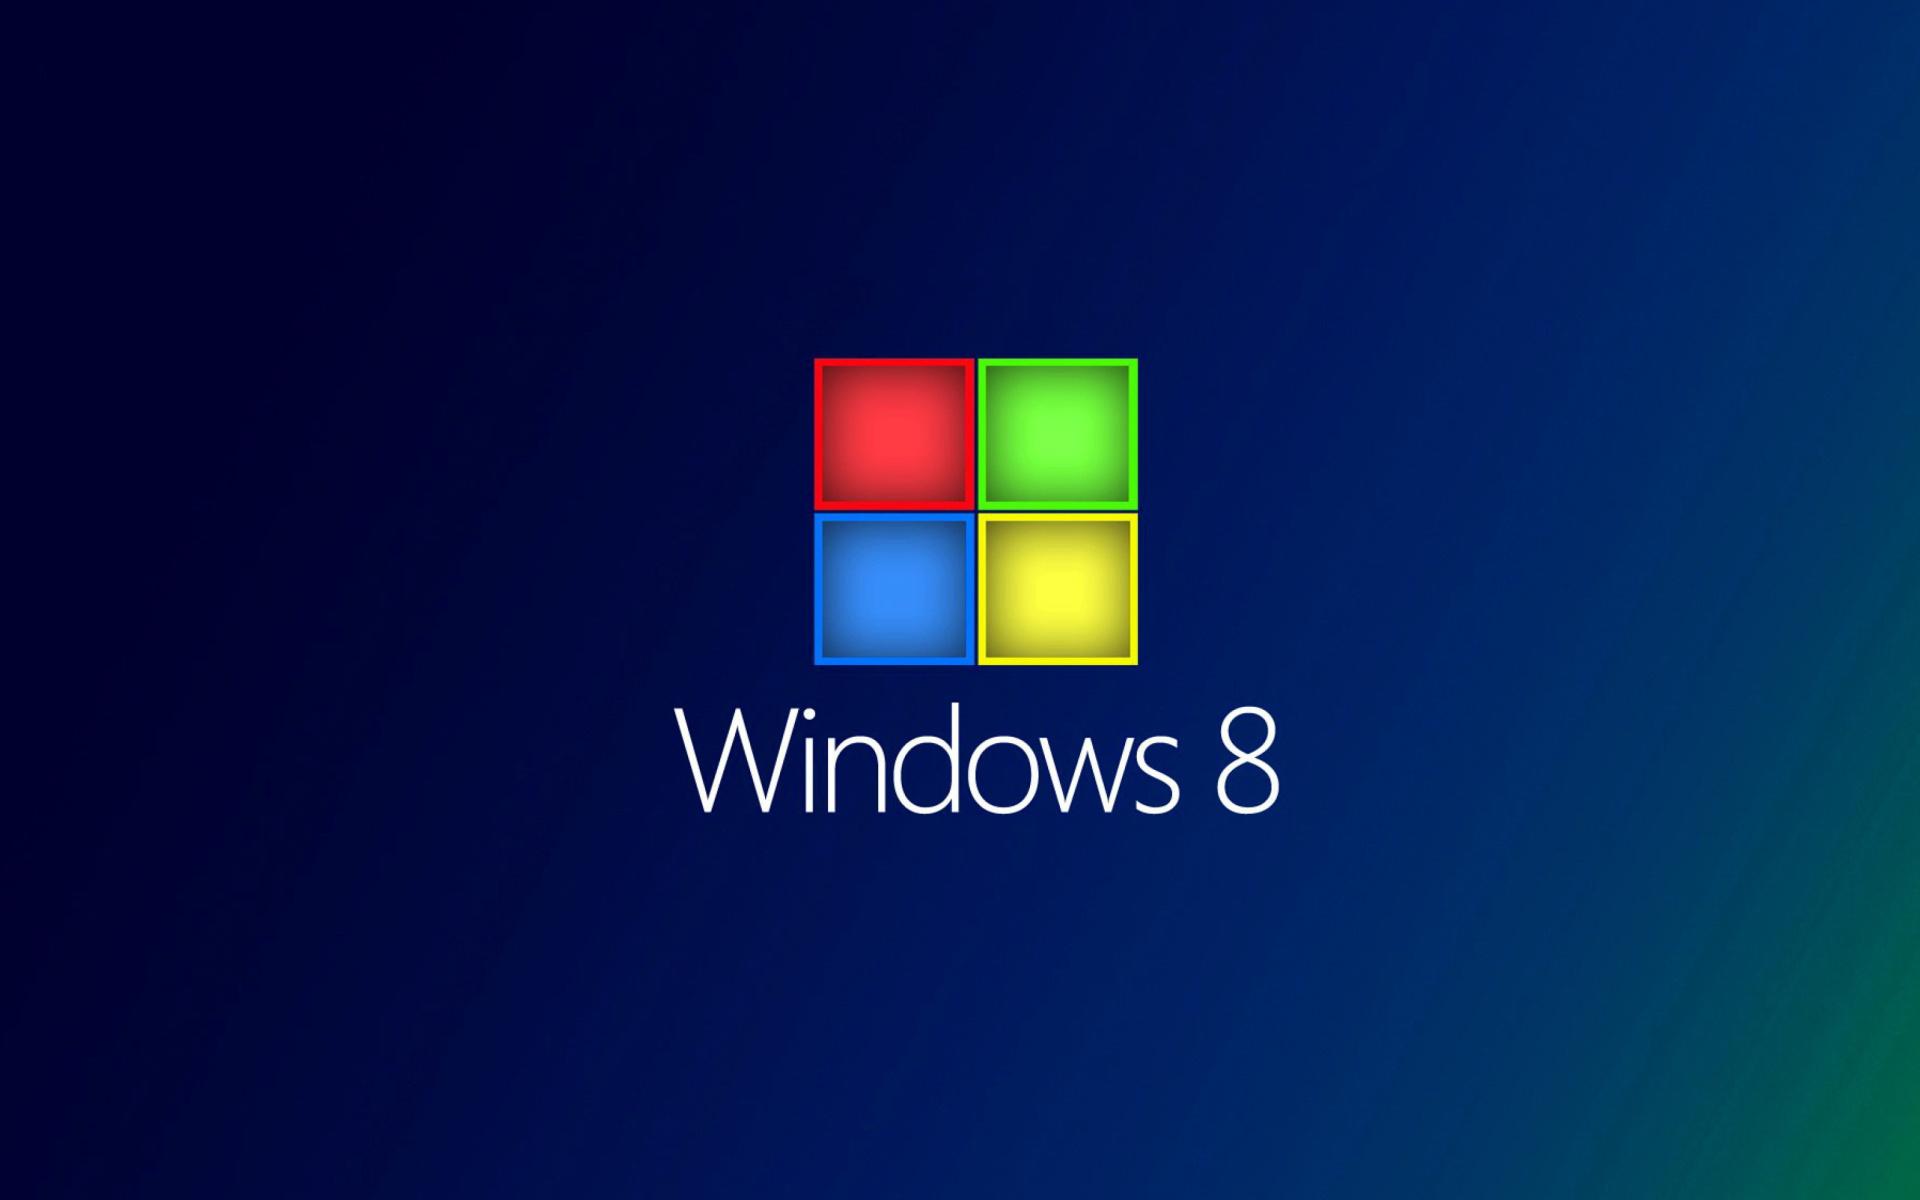 Microsoft windows 8 wallpaper for widescreen desktop pc for Latest windows for pc